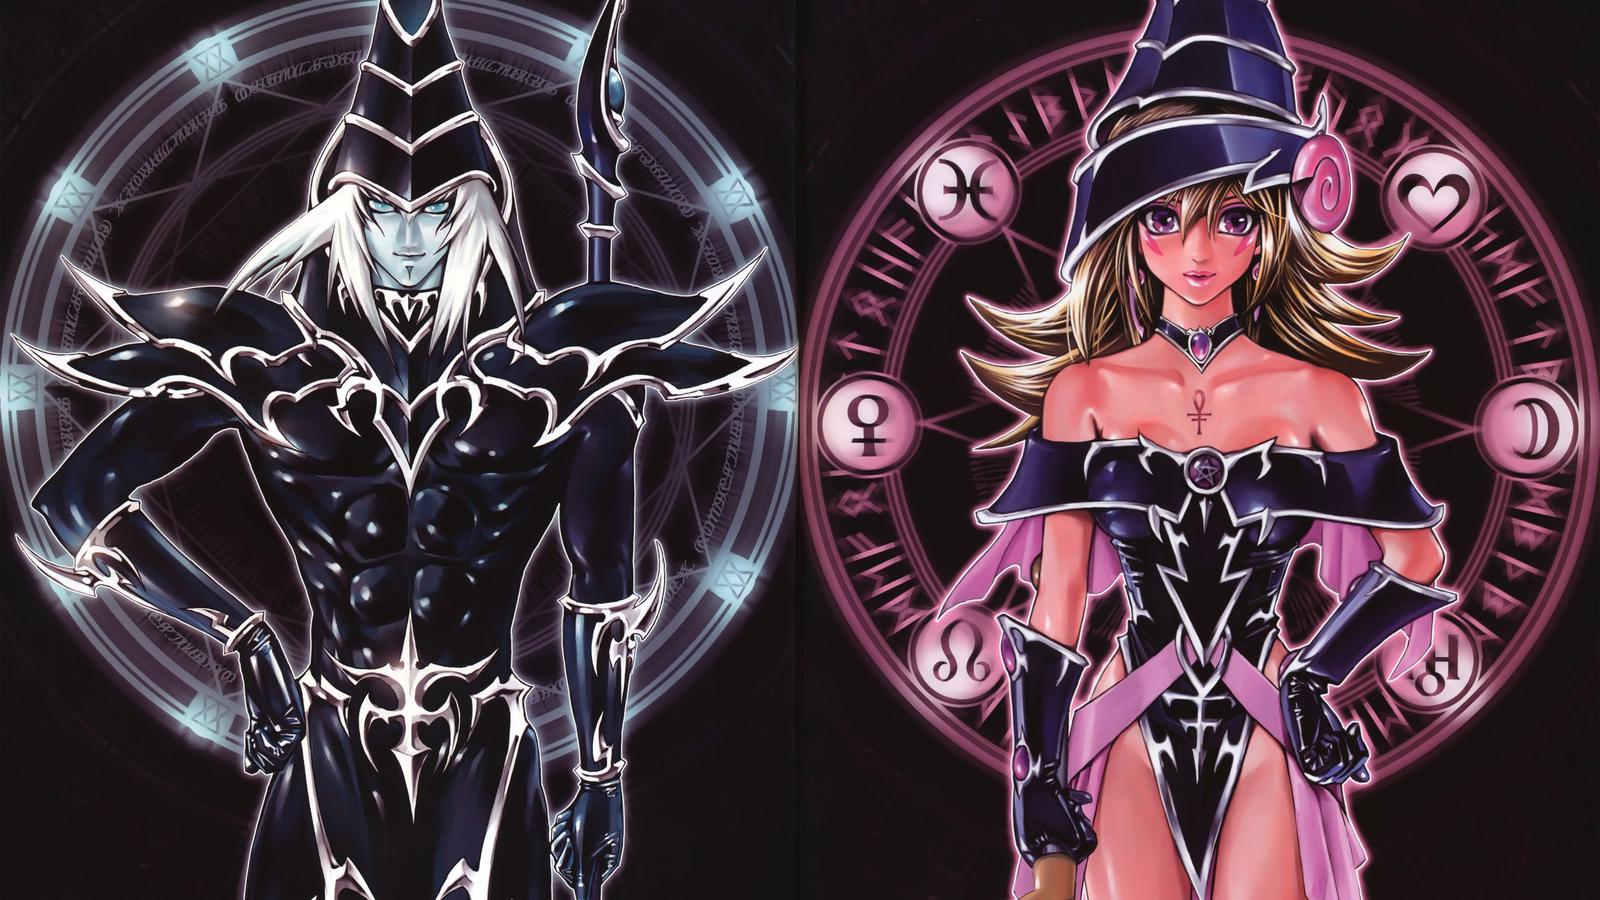 Free Download Dark Magician And Dark Magician Girl Artwork By